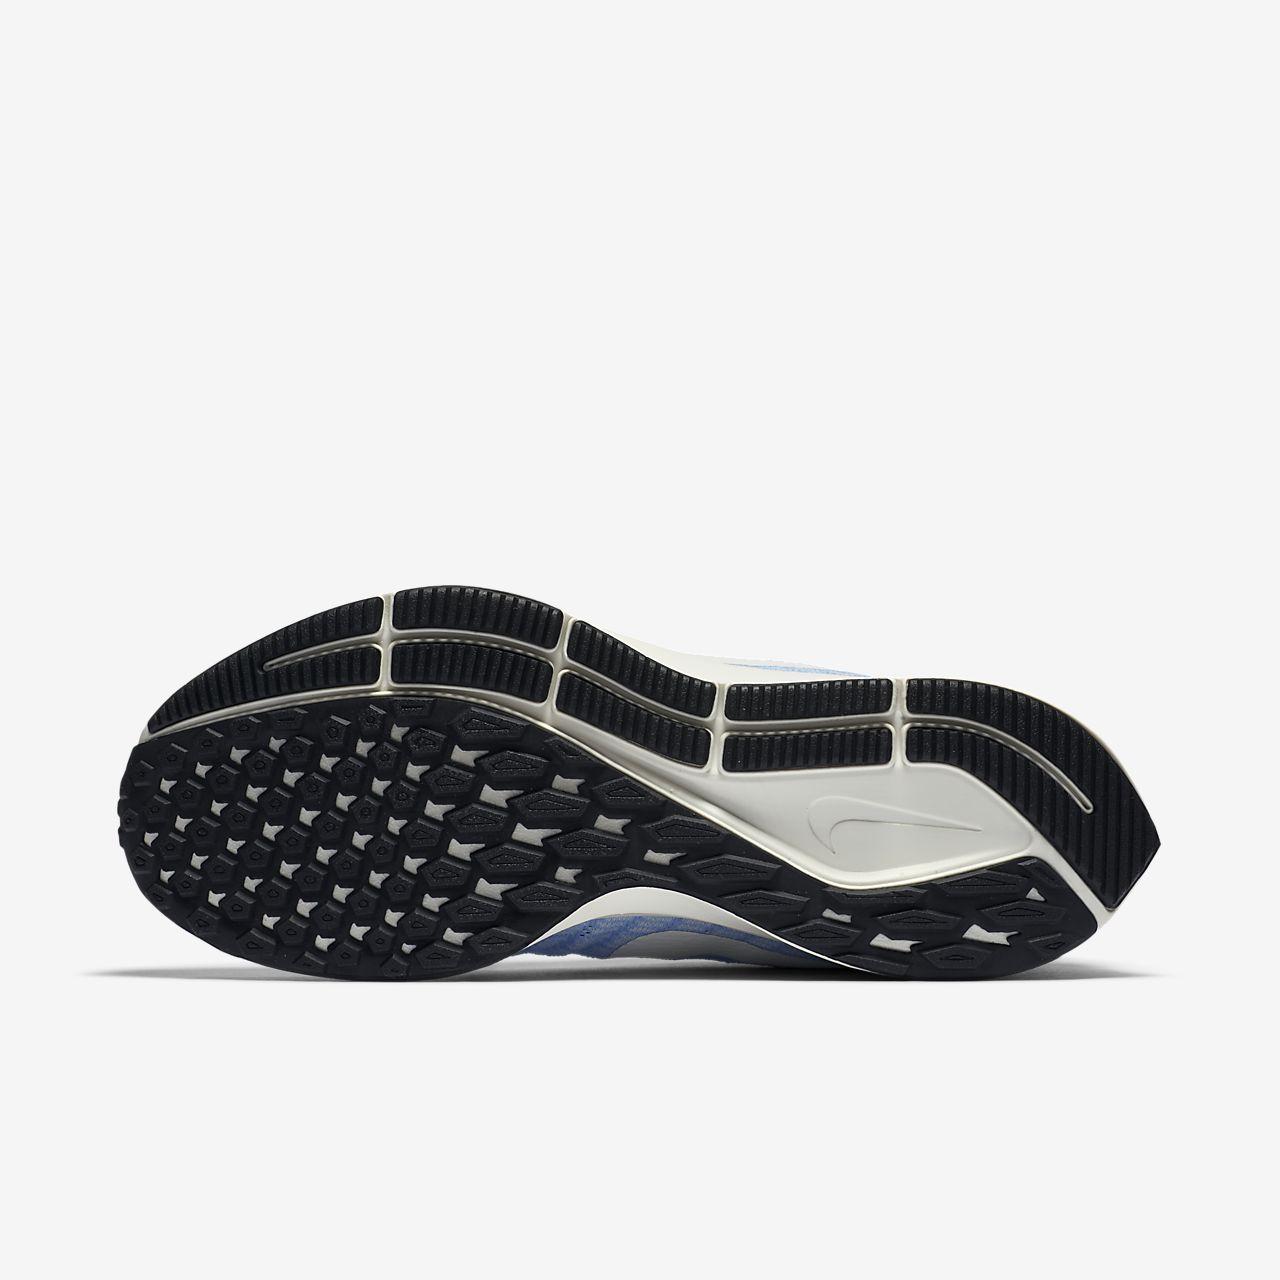 86daaa8f5ed9 Nike Air Zoom Pegasus 35 Women s Running Shoe. Nike.com